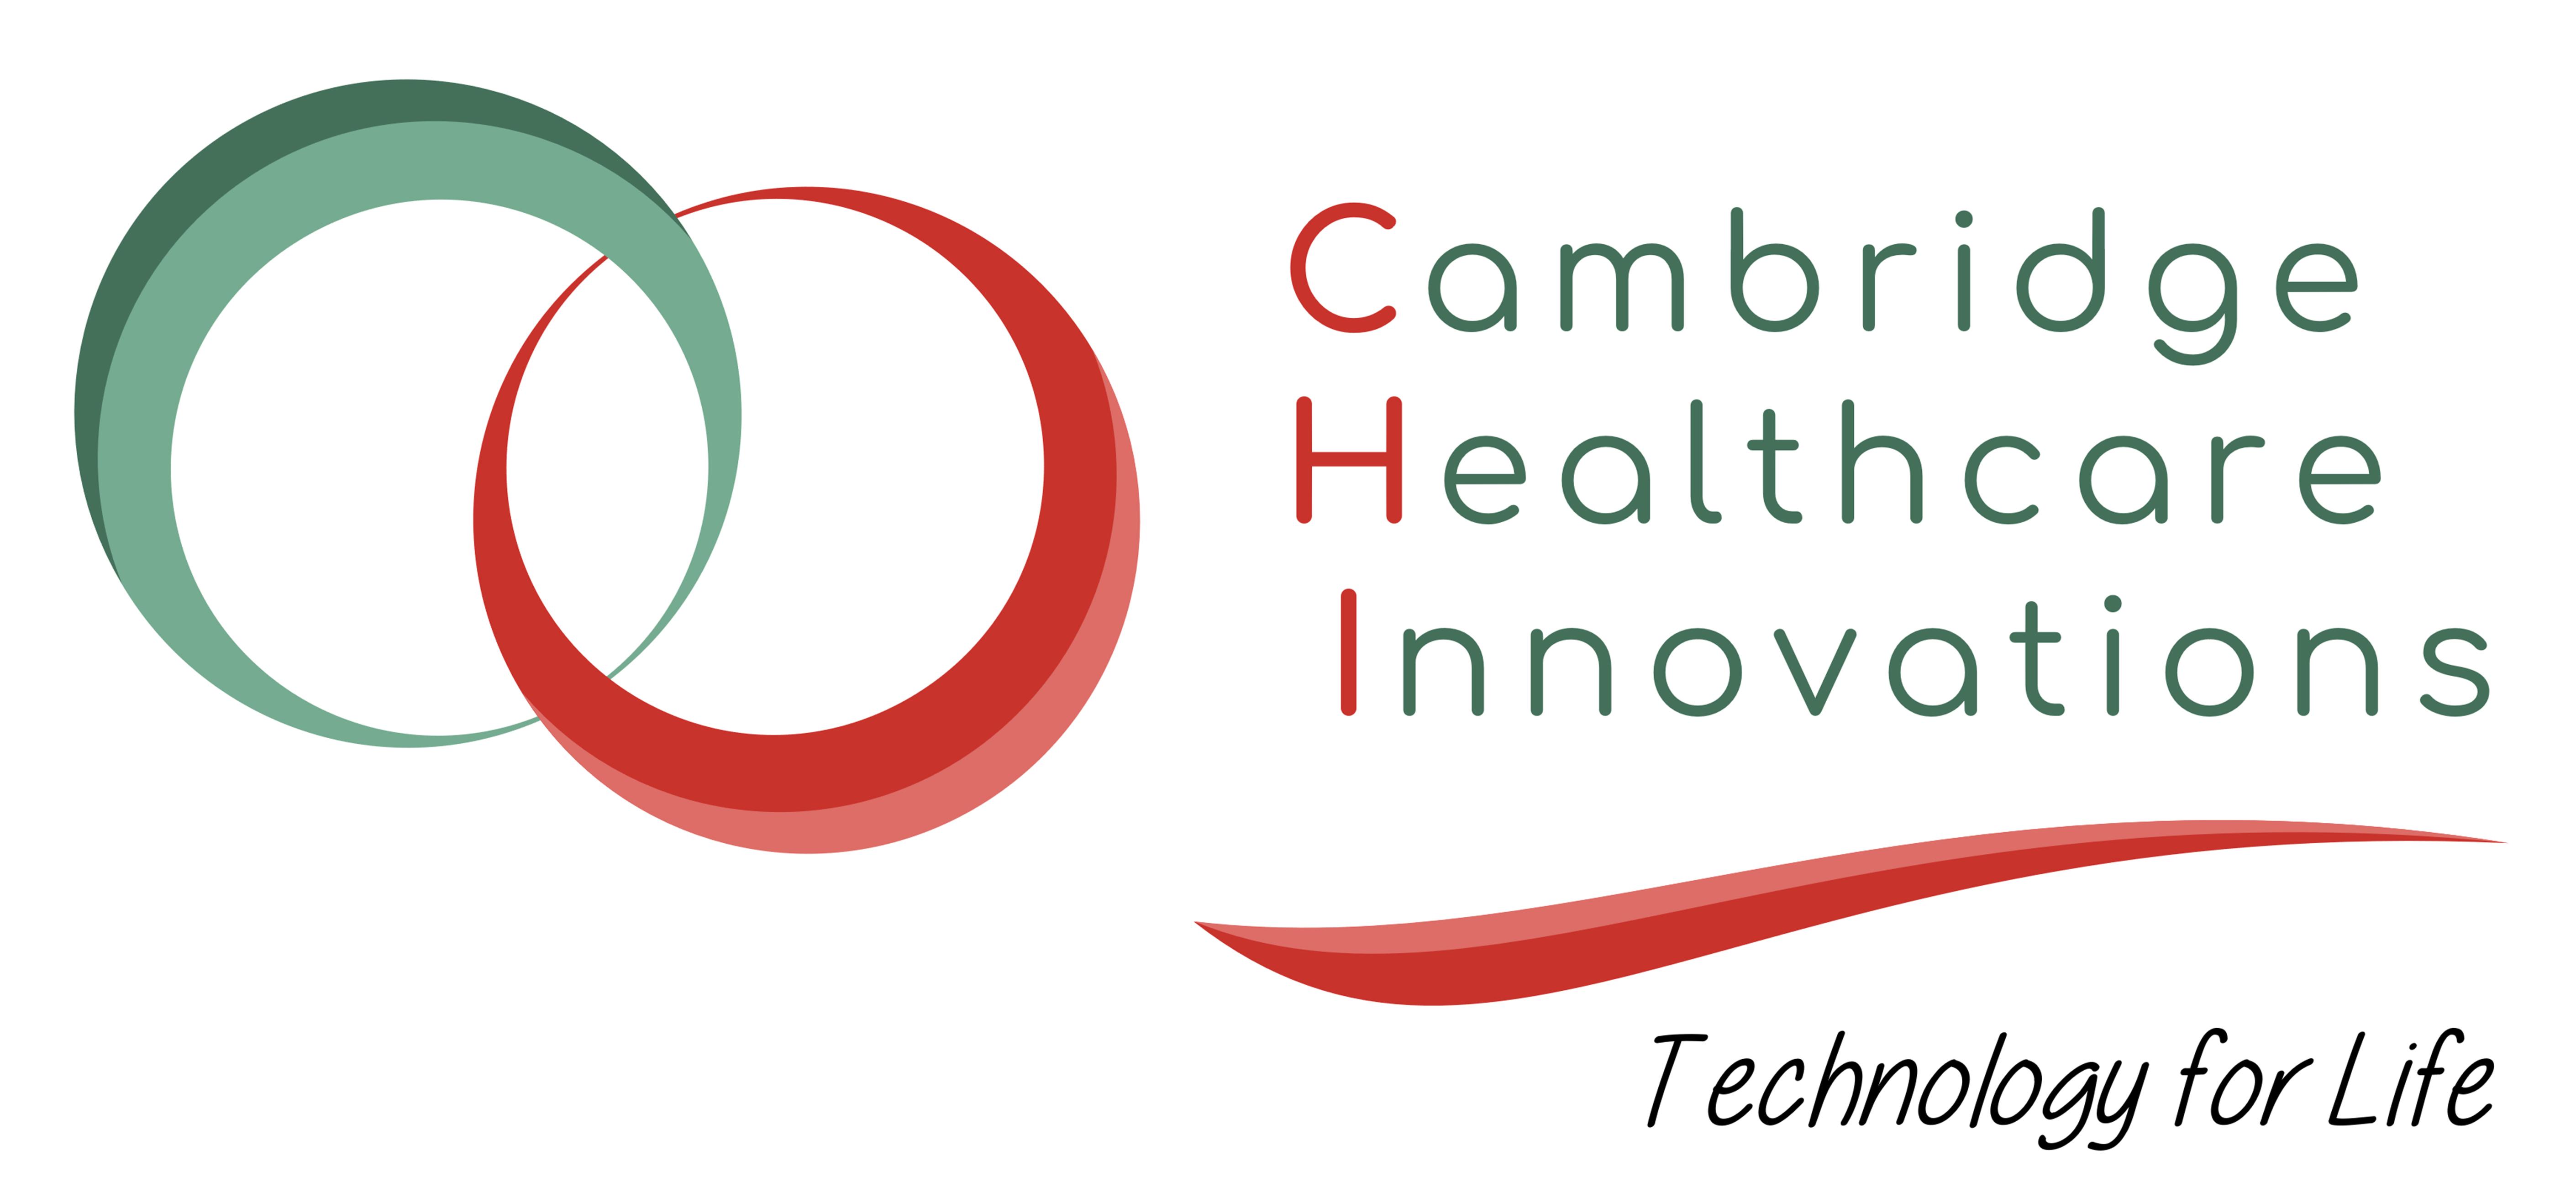 http://www.cambridgehealthcareinnovations.com